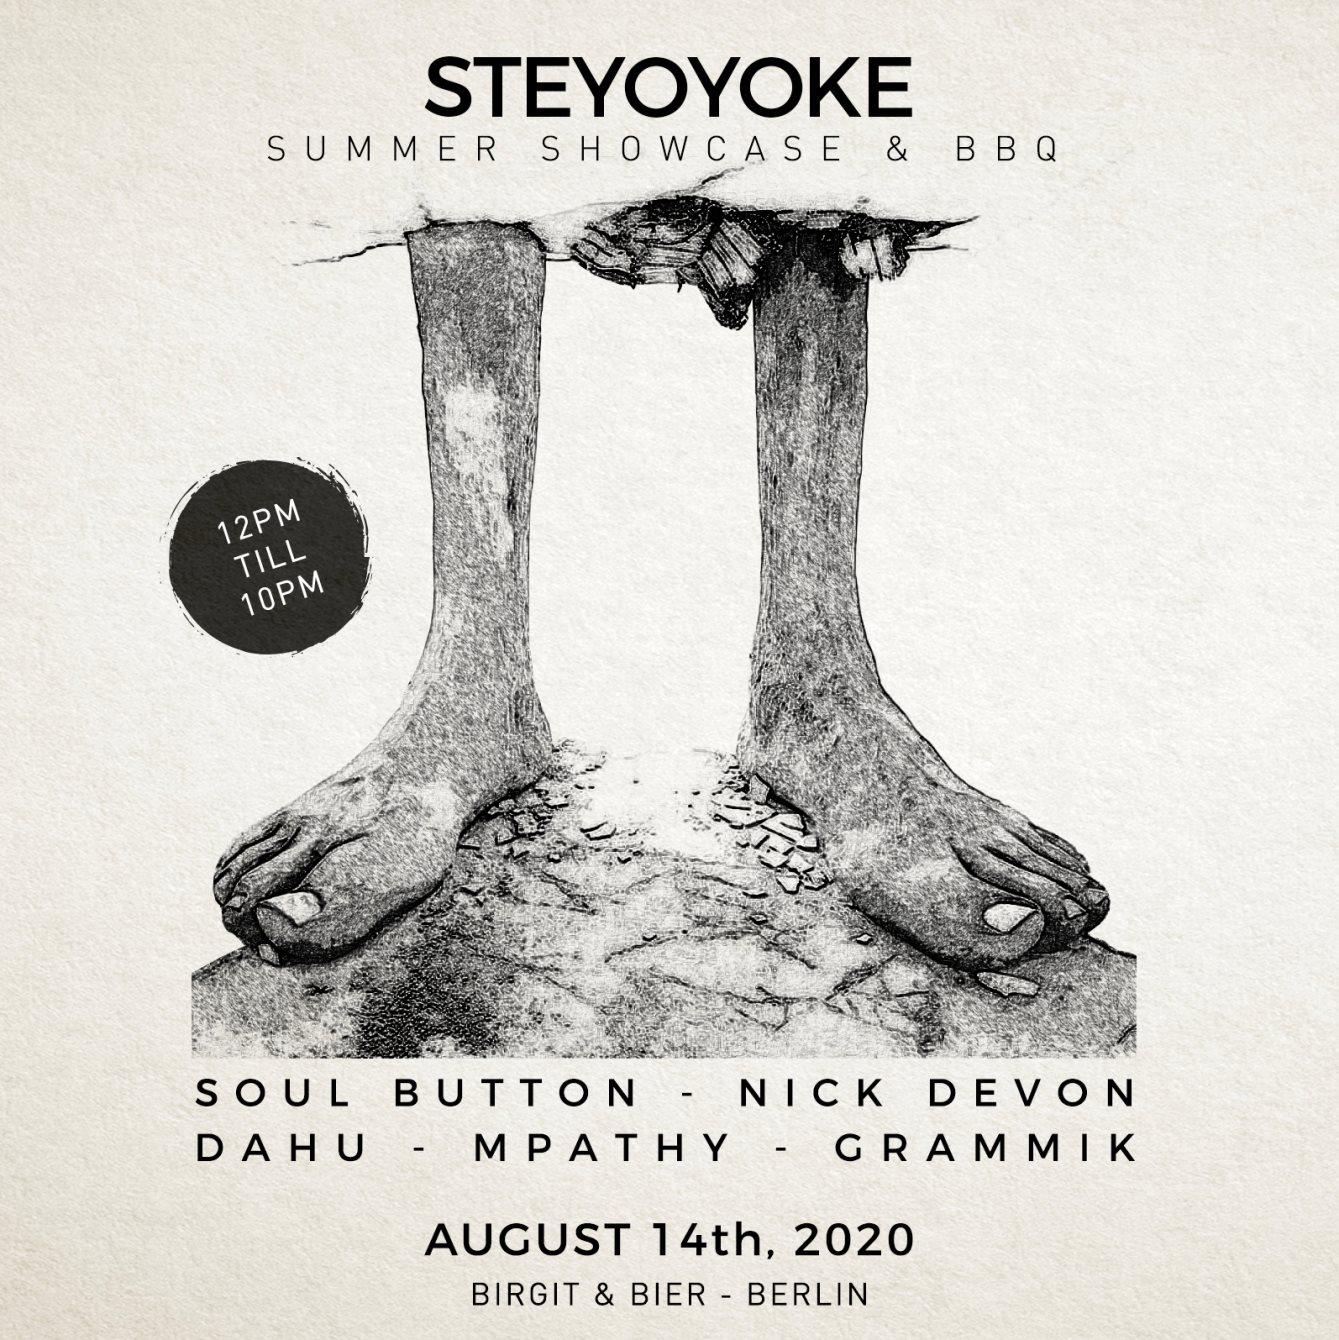 Steyoyoke Summer Showcase 2020 - Flyer front